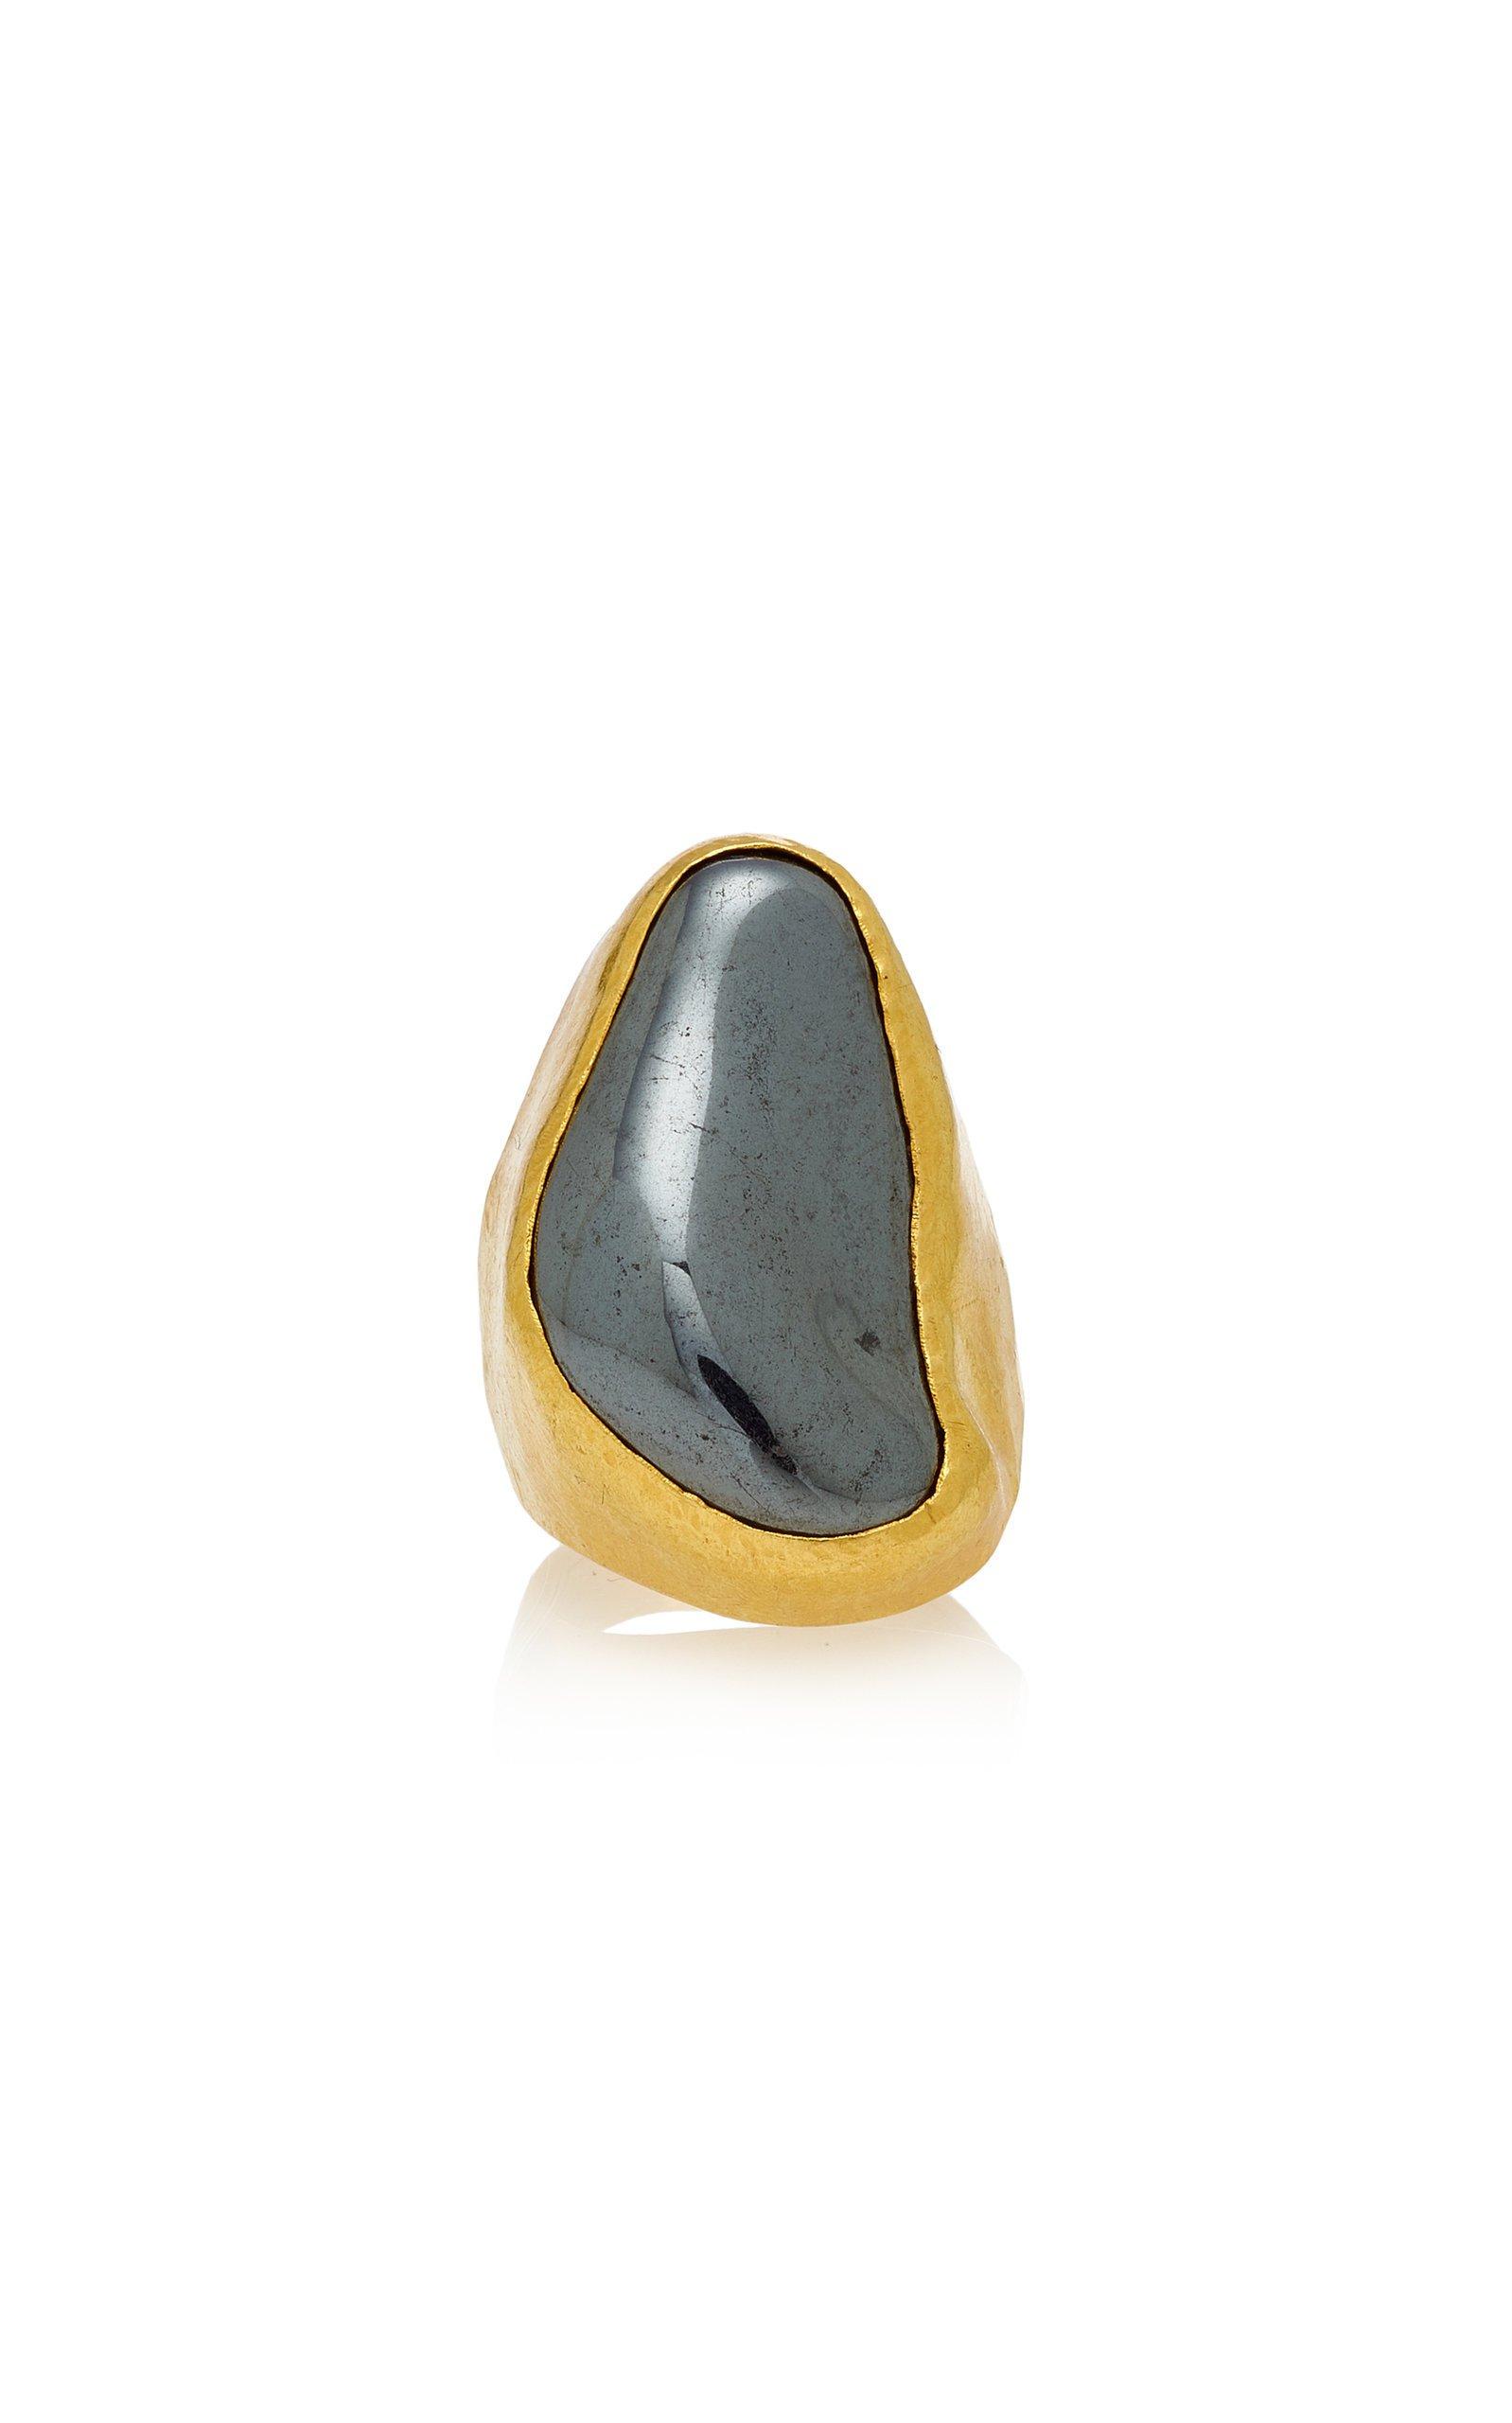 Pippa Small Tibetan Ring With Hematite